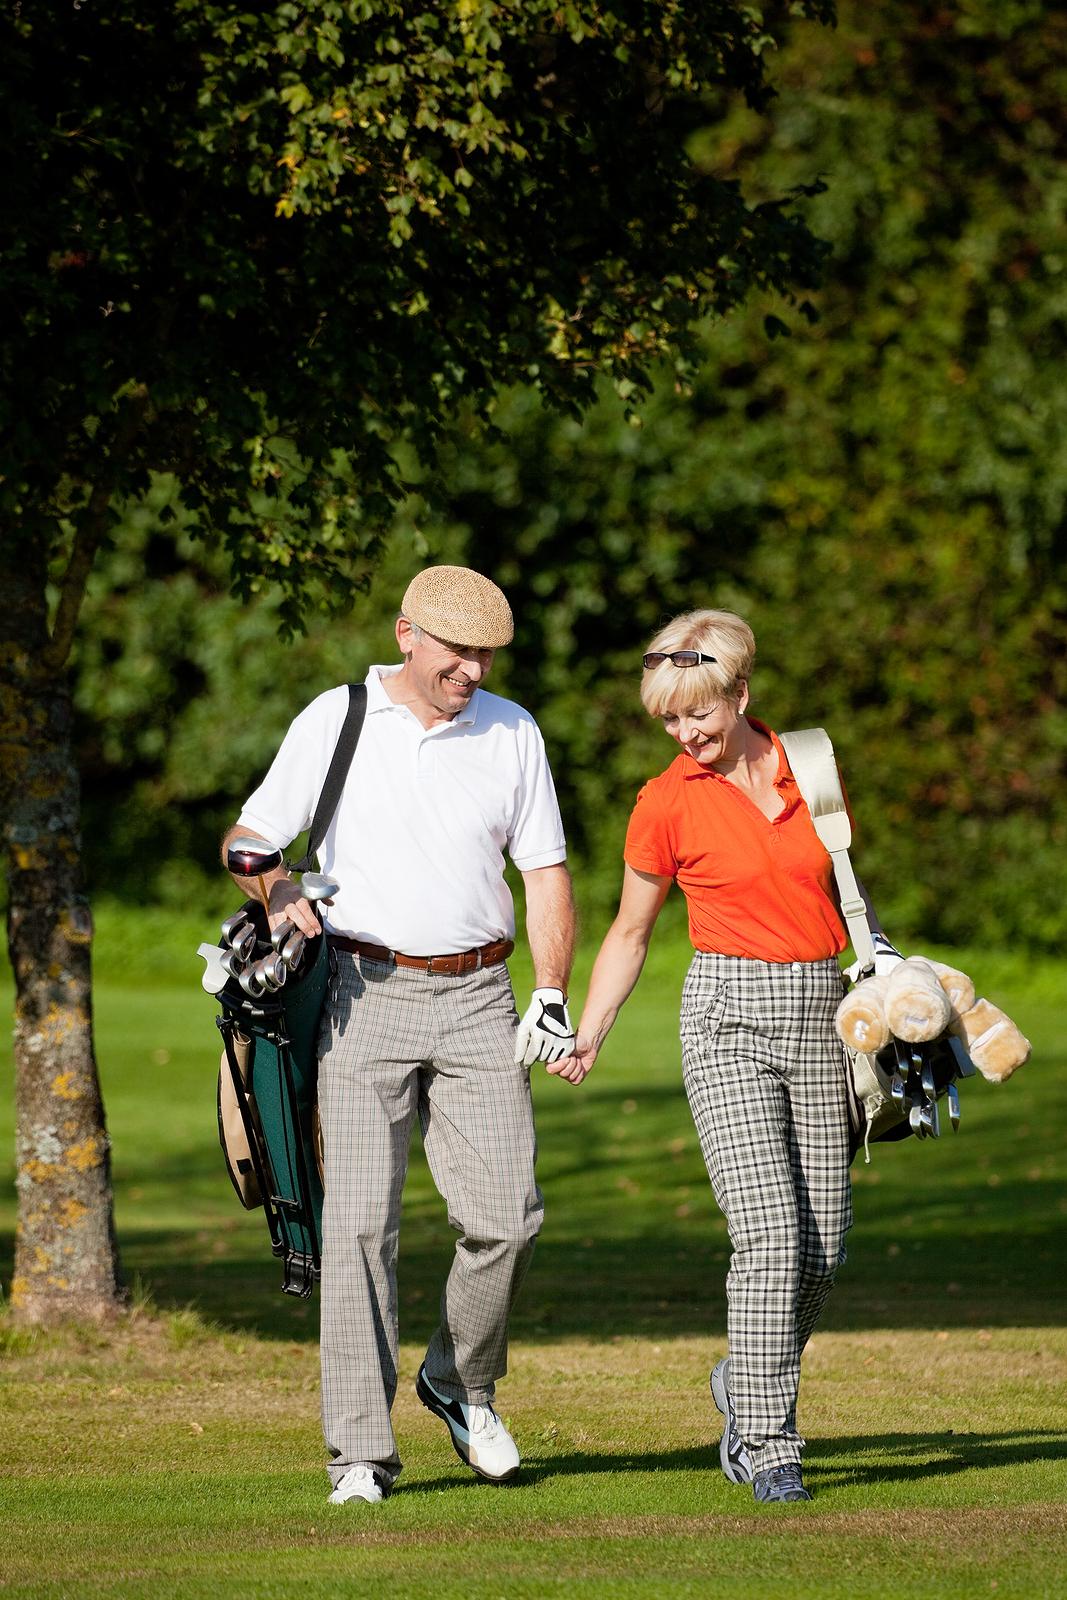 bigstock_Mature_couple_playing_Golf_6562894.jpg